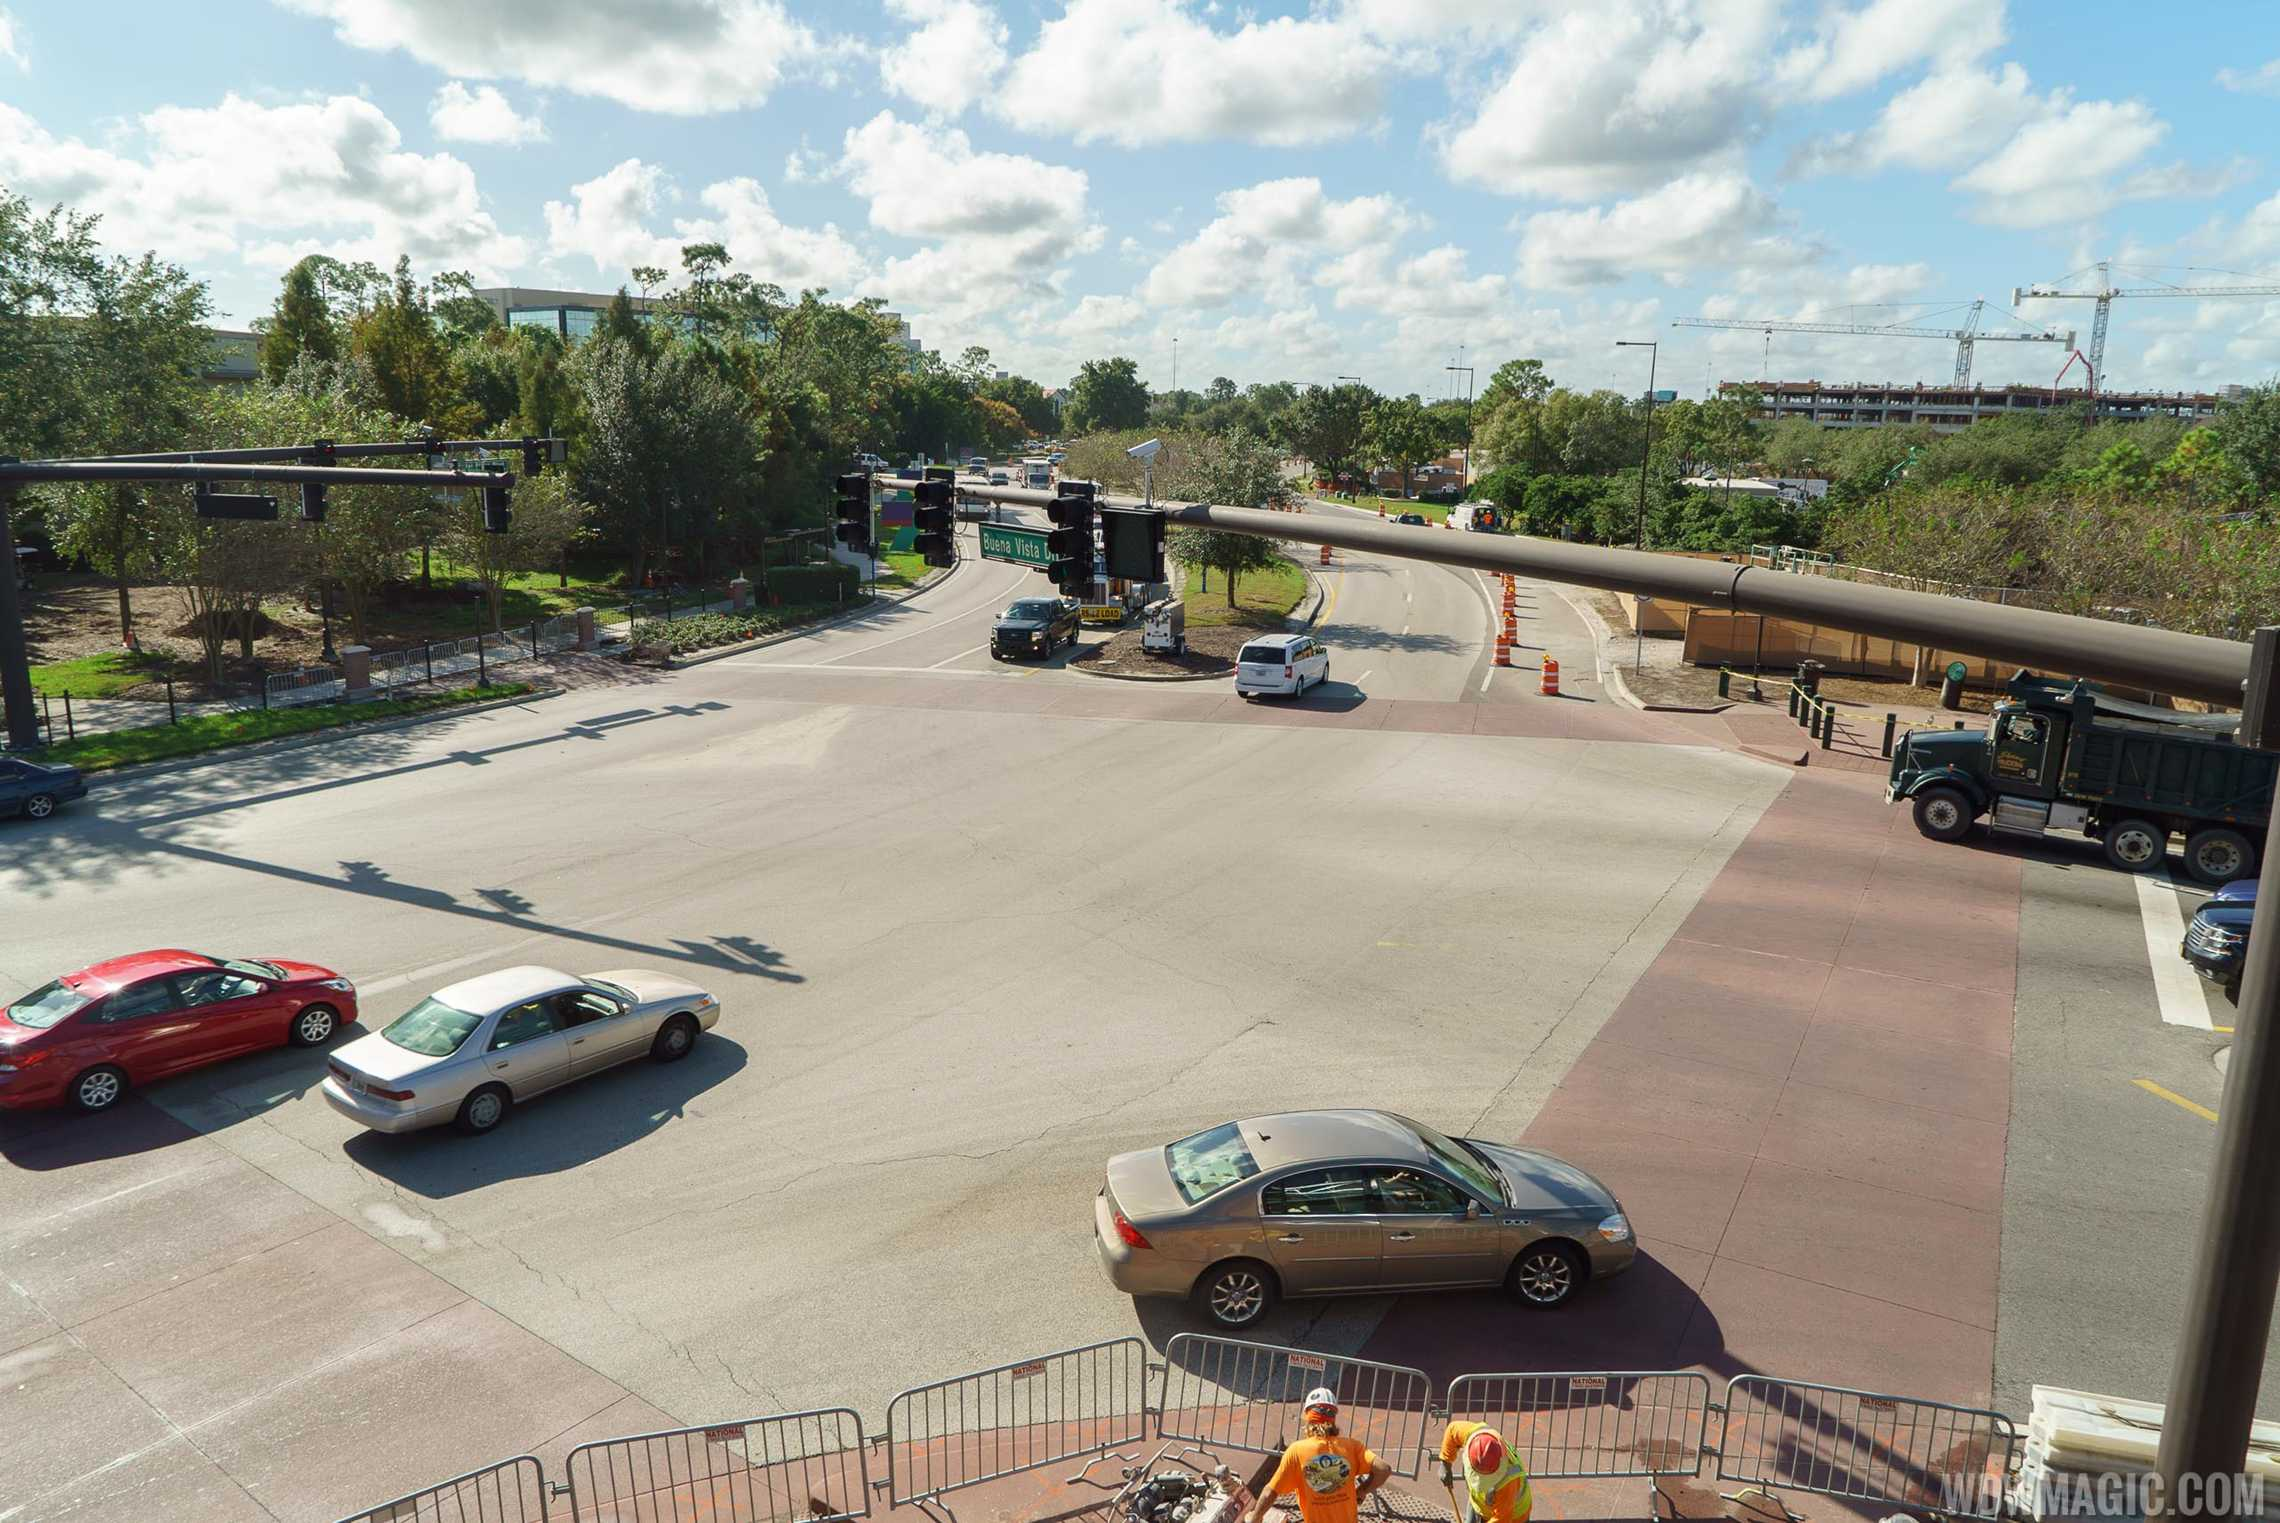 View of Buena Vista Drive from the bridge